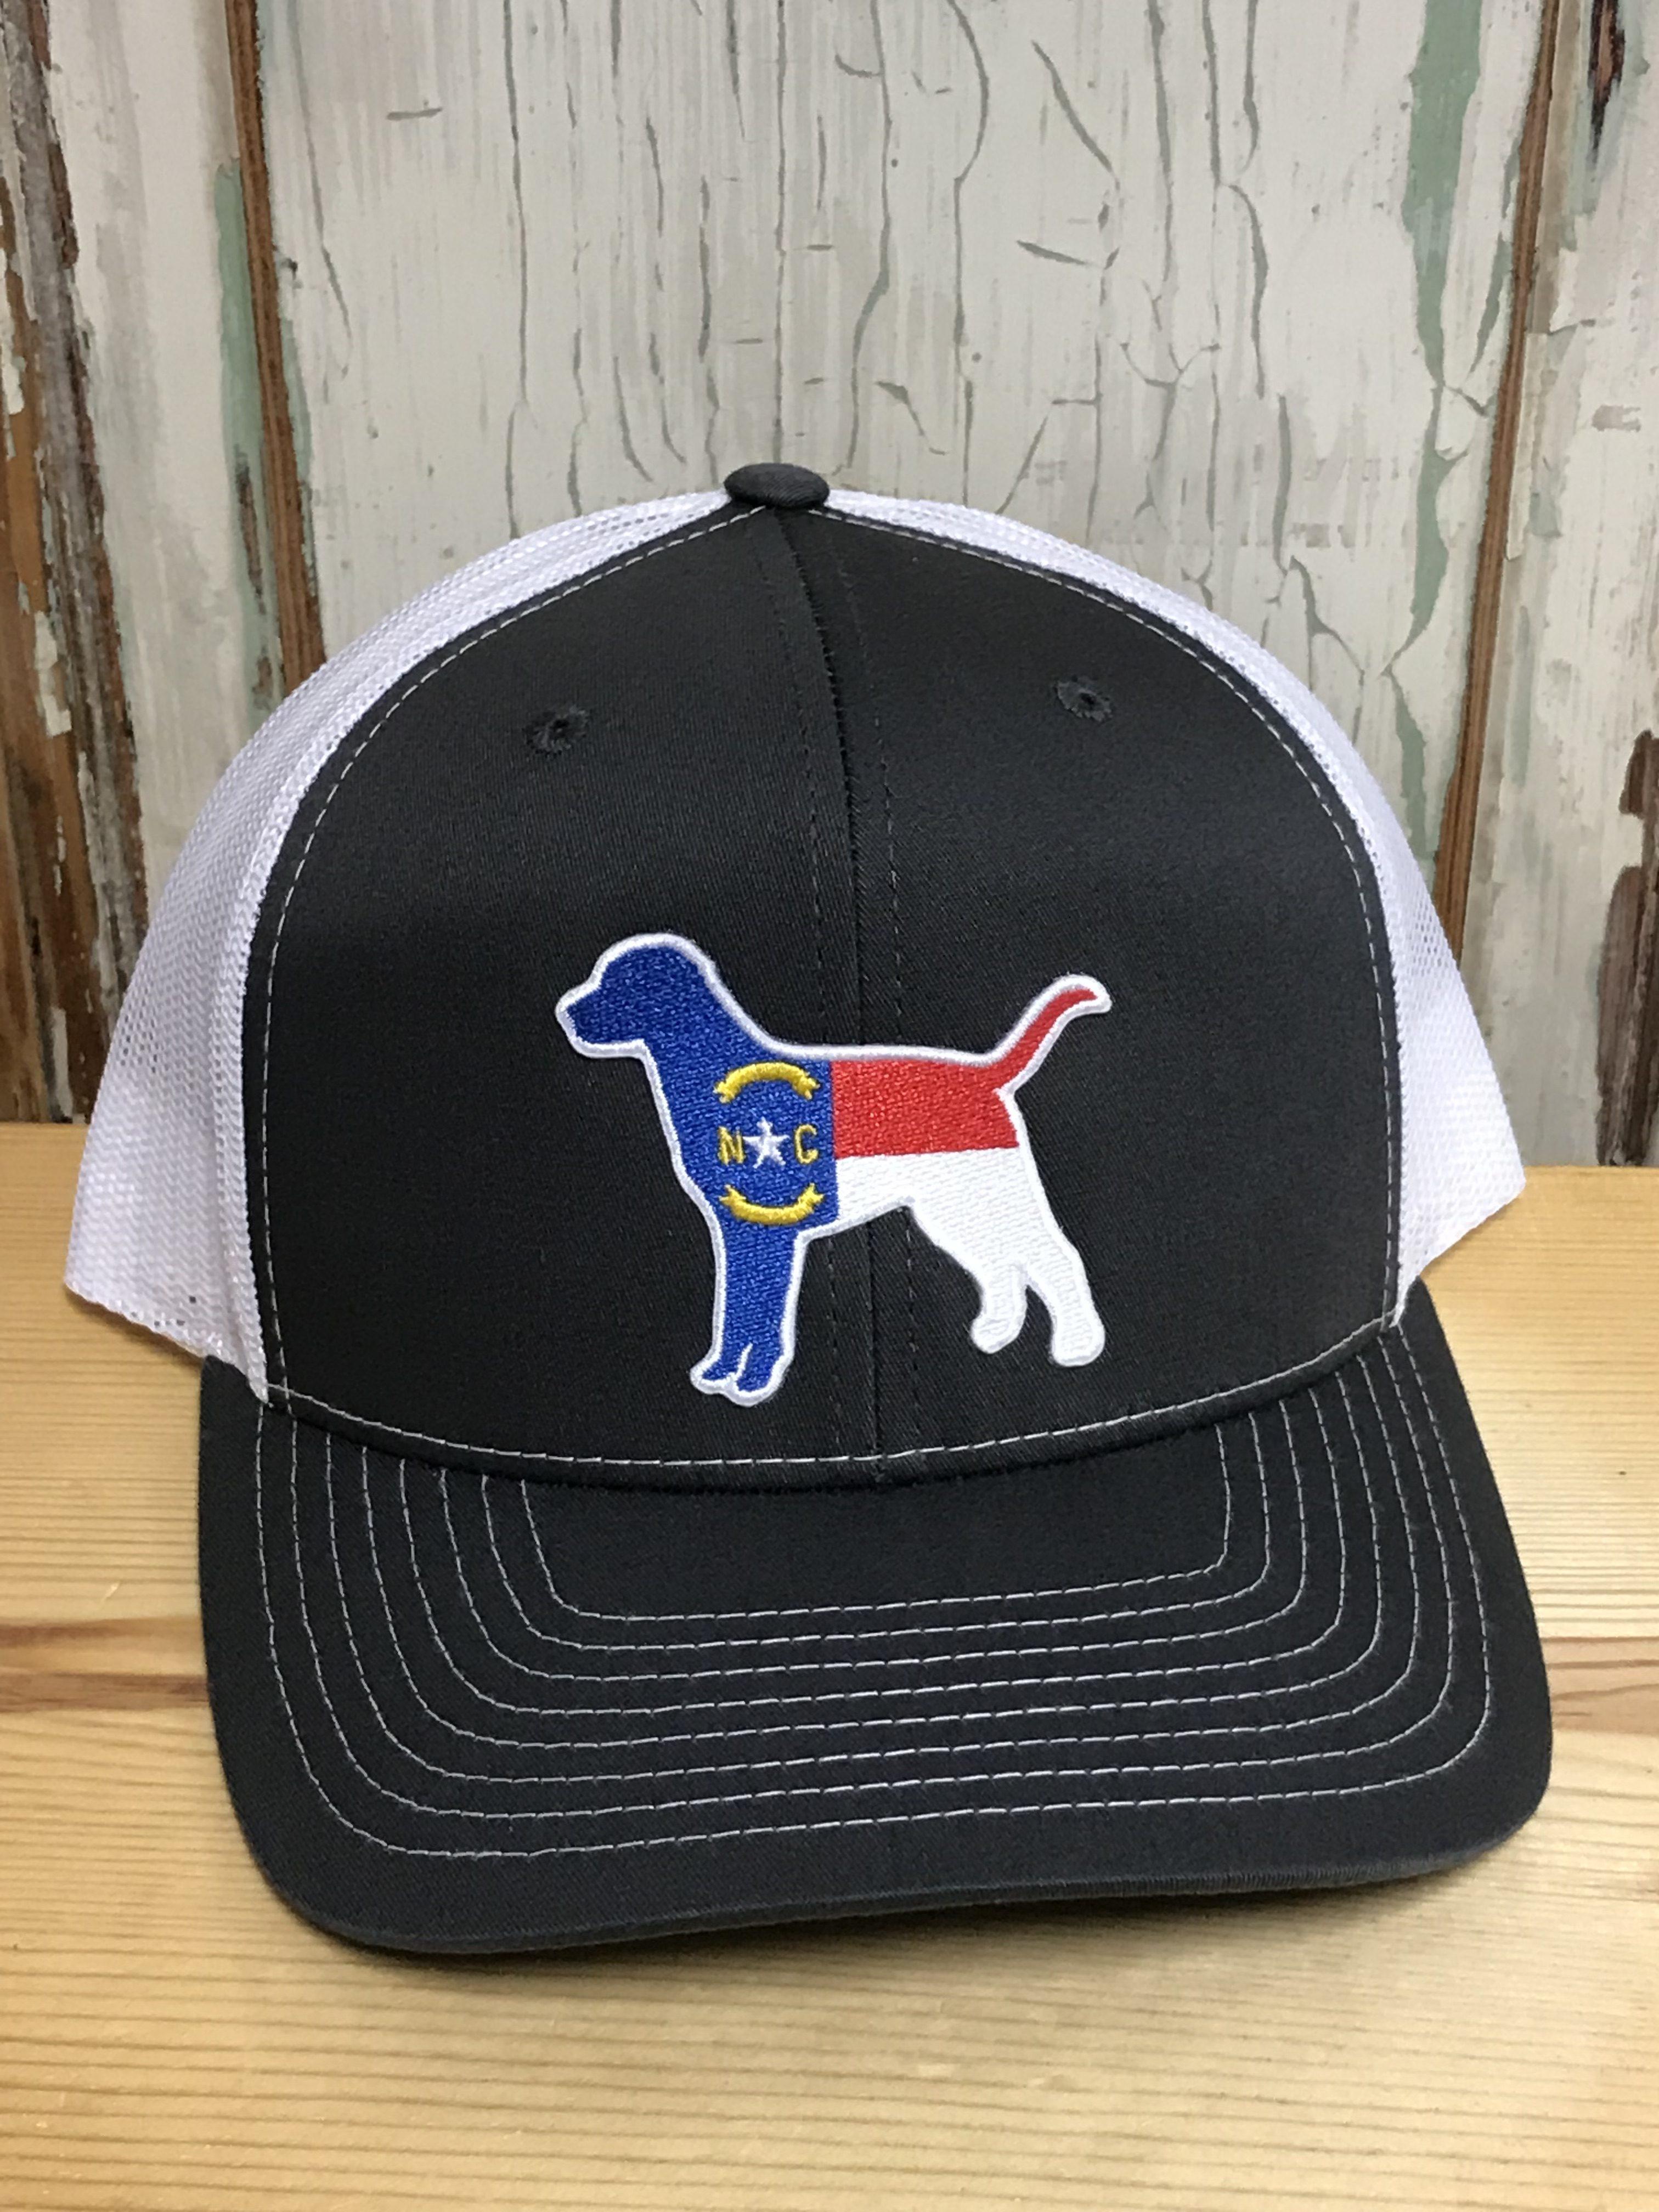 619f78f3a18c2 North Carolina Dog Patch Snapback Trucker Hat Charcoal White Accessories